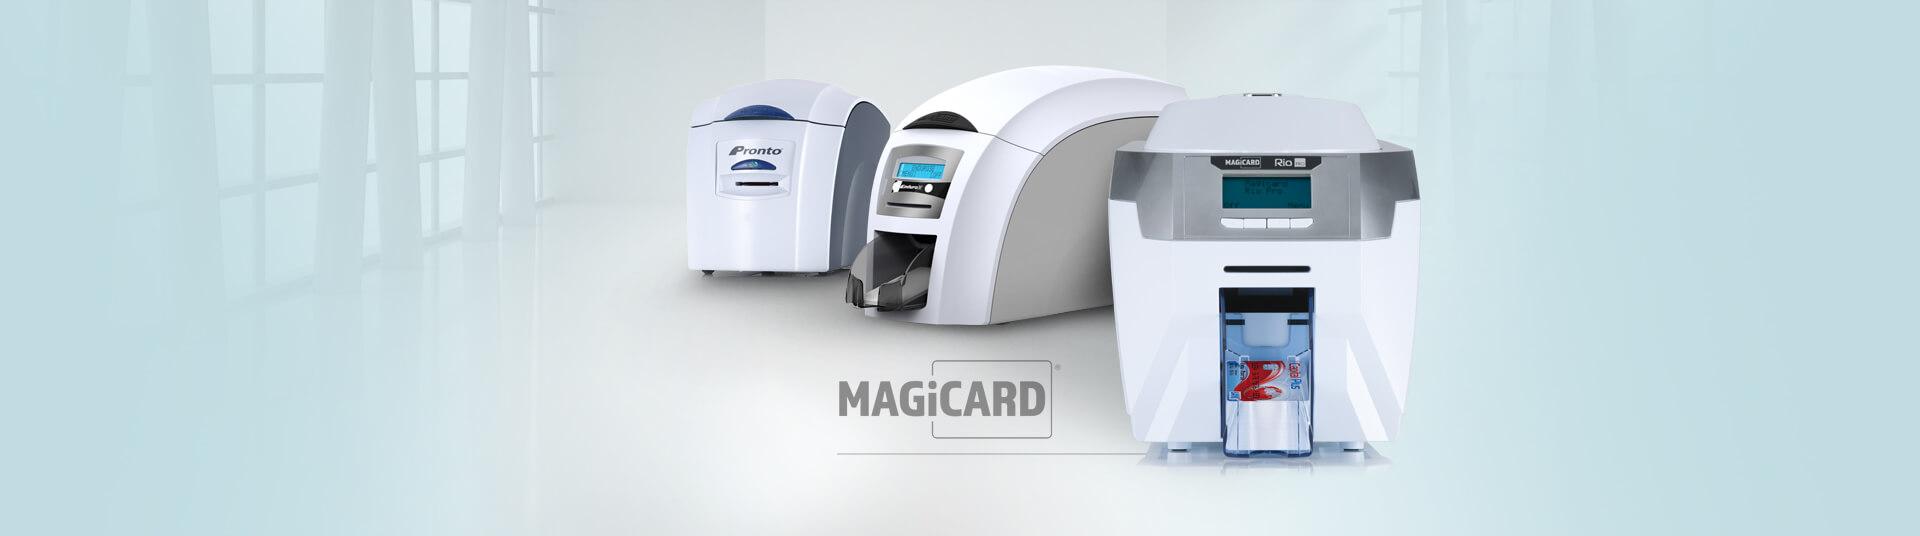 Magicard Photo ID Printers